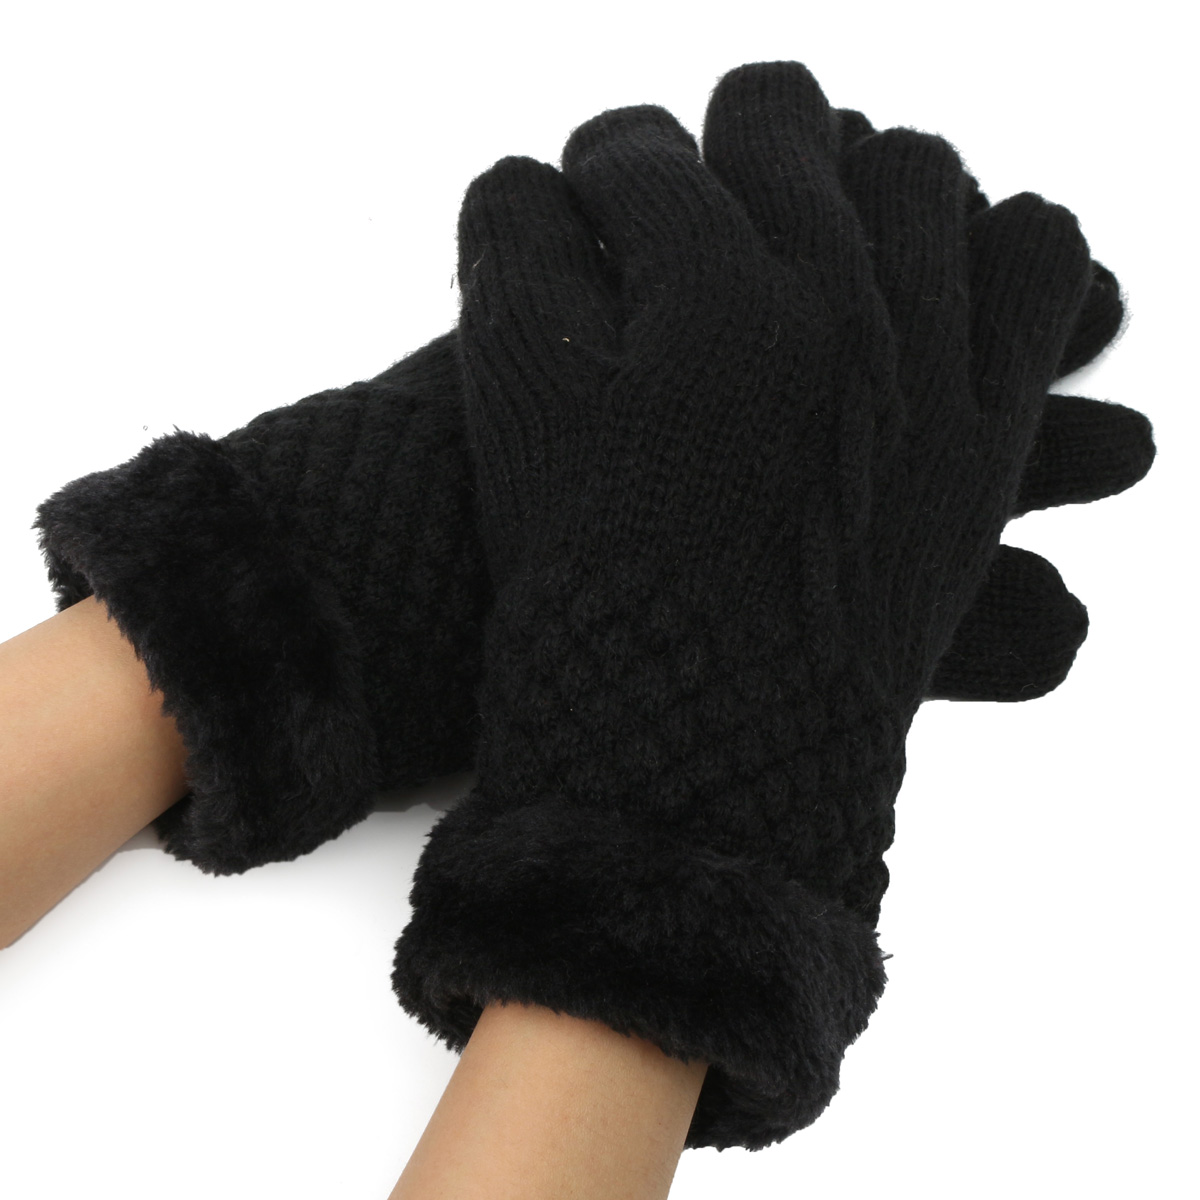 New Fashion Women's Winter Warm Knit Gloves Warmer Mittens Finger Gloves New